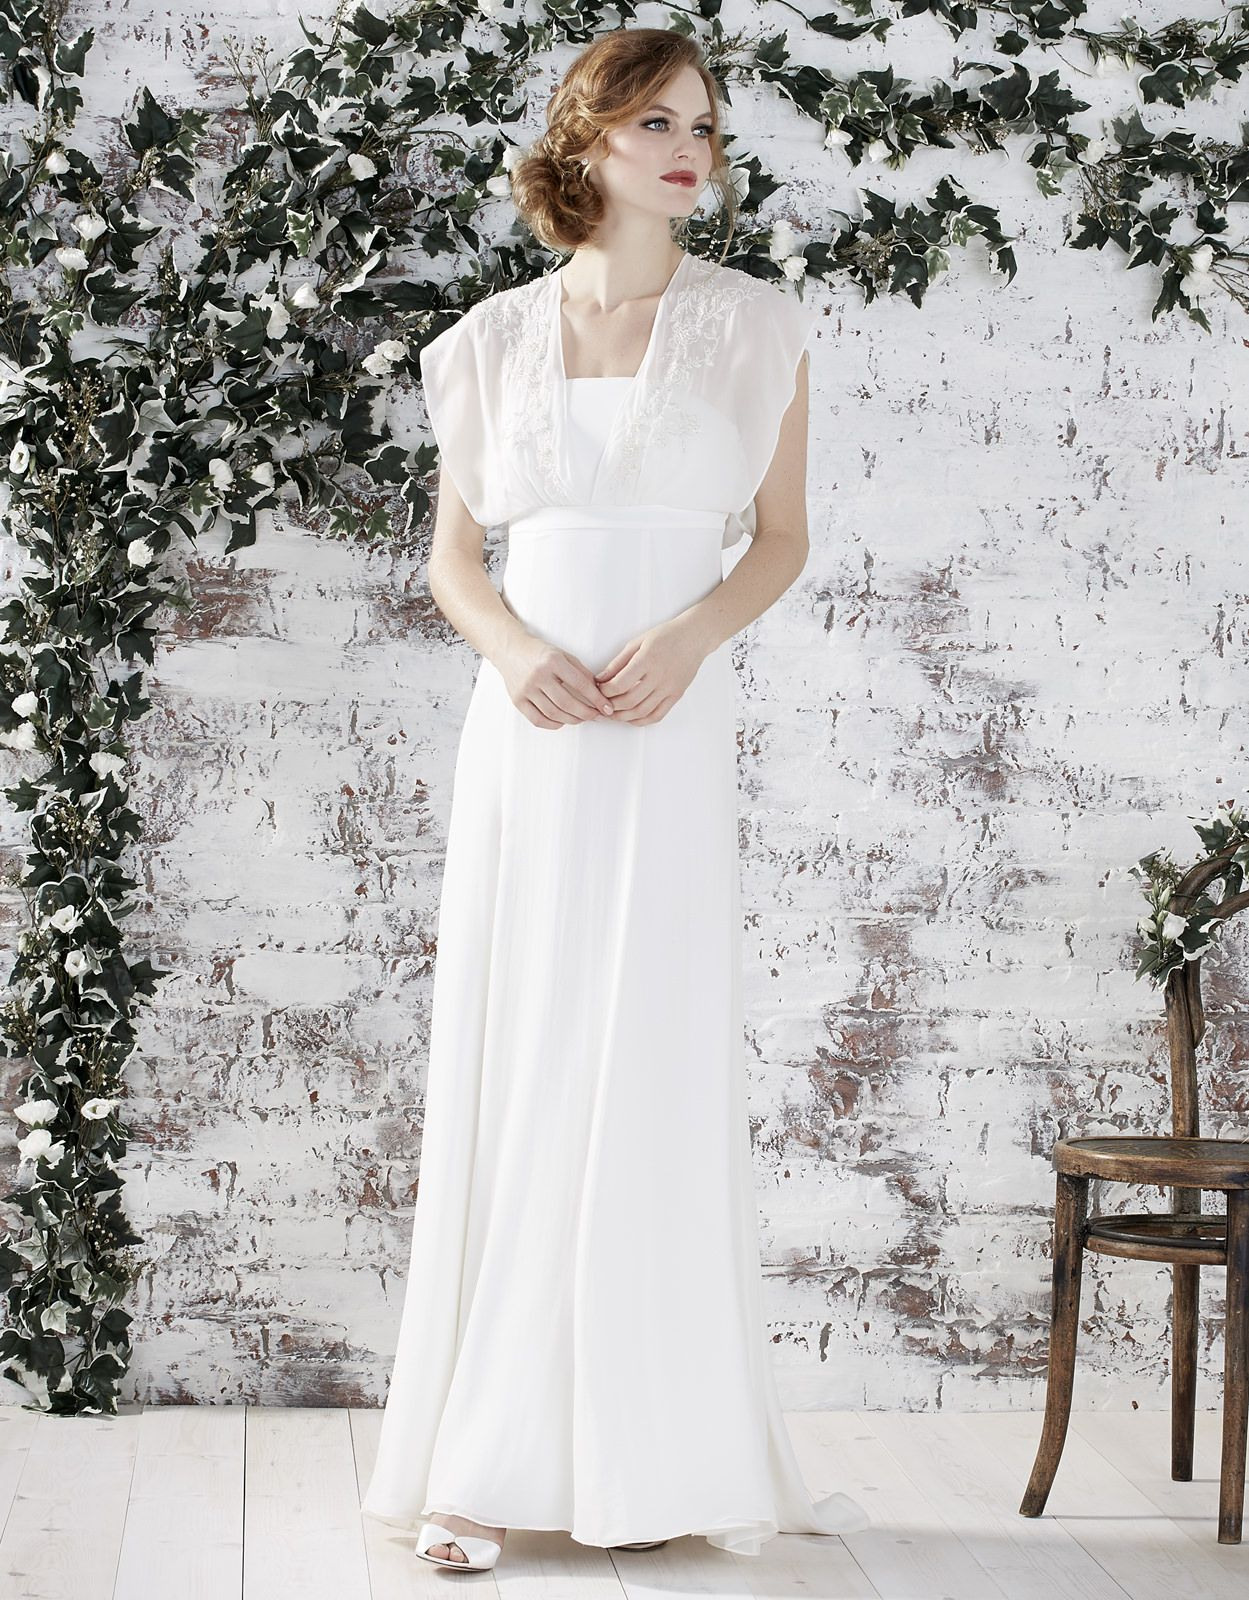 Cheap wedding dresses monsoon uk